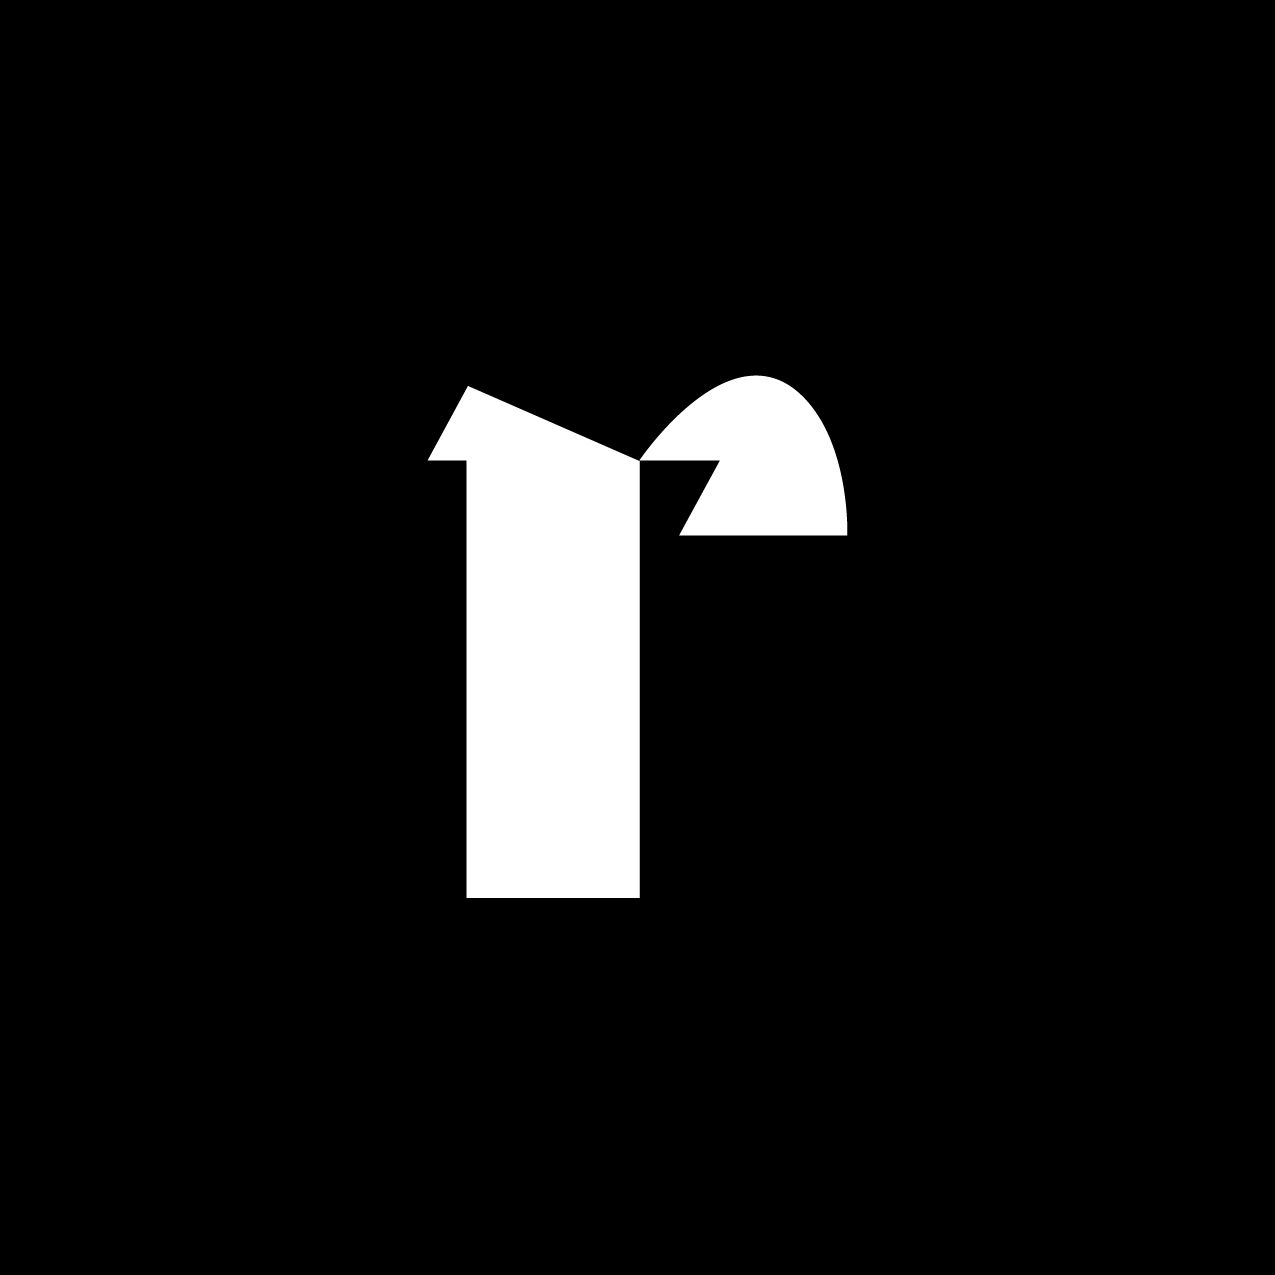 Letter R13 Design by Furia